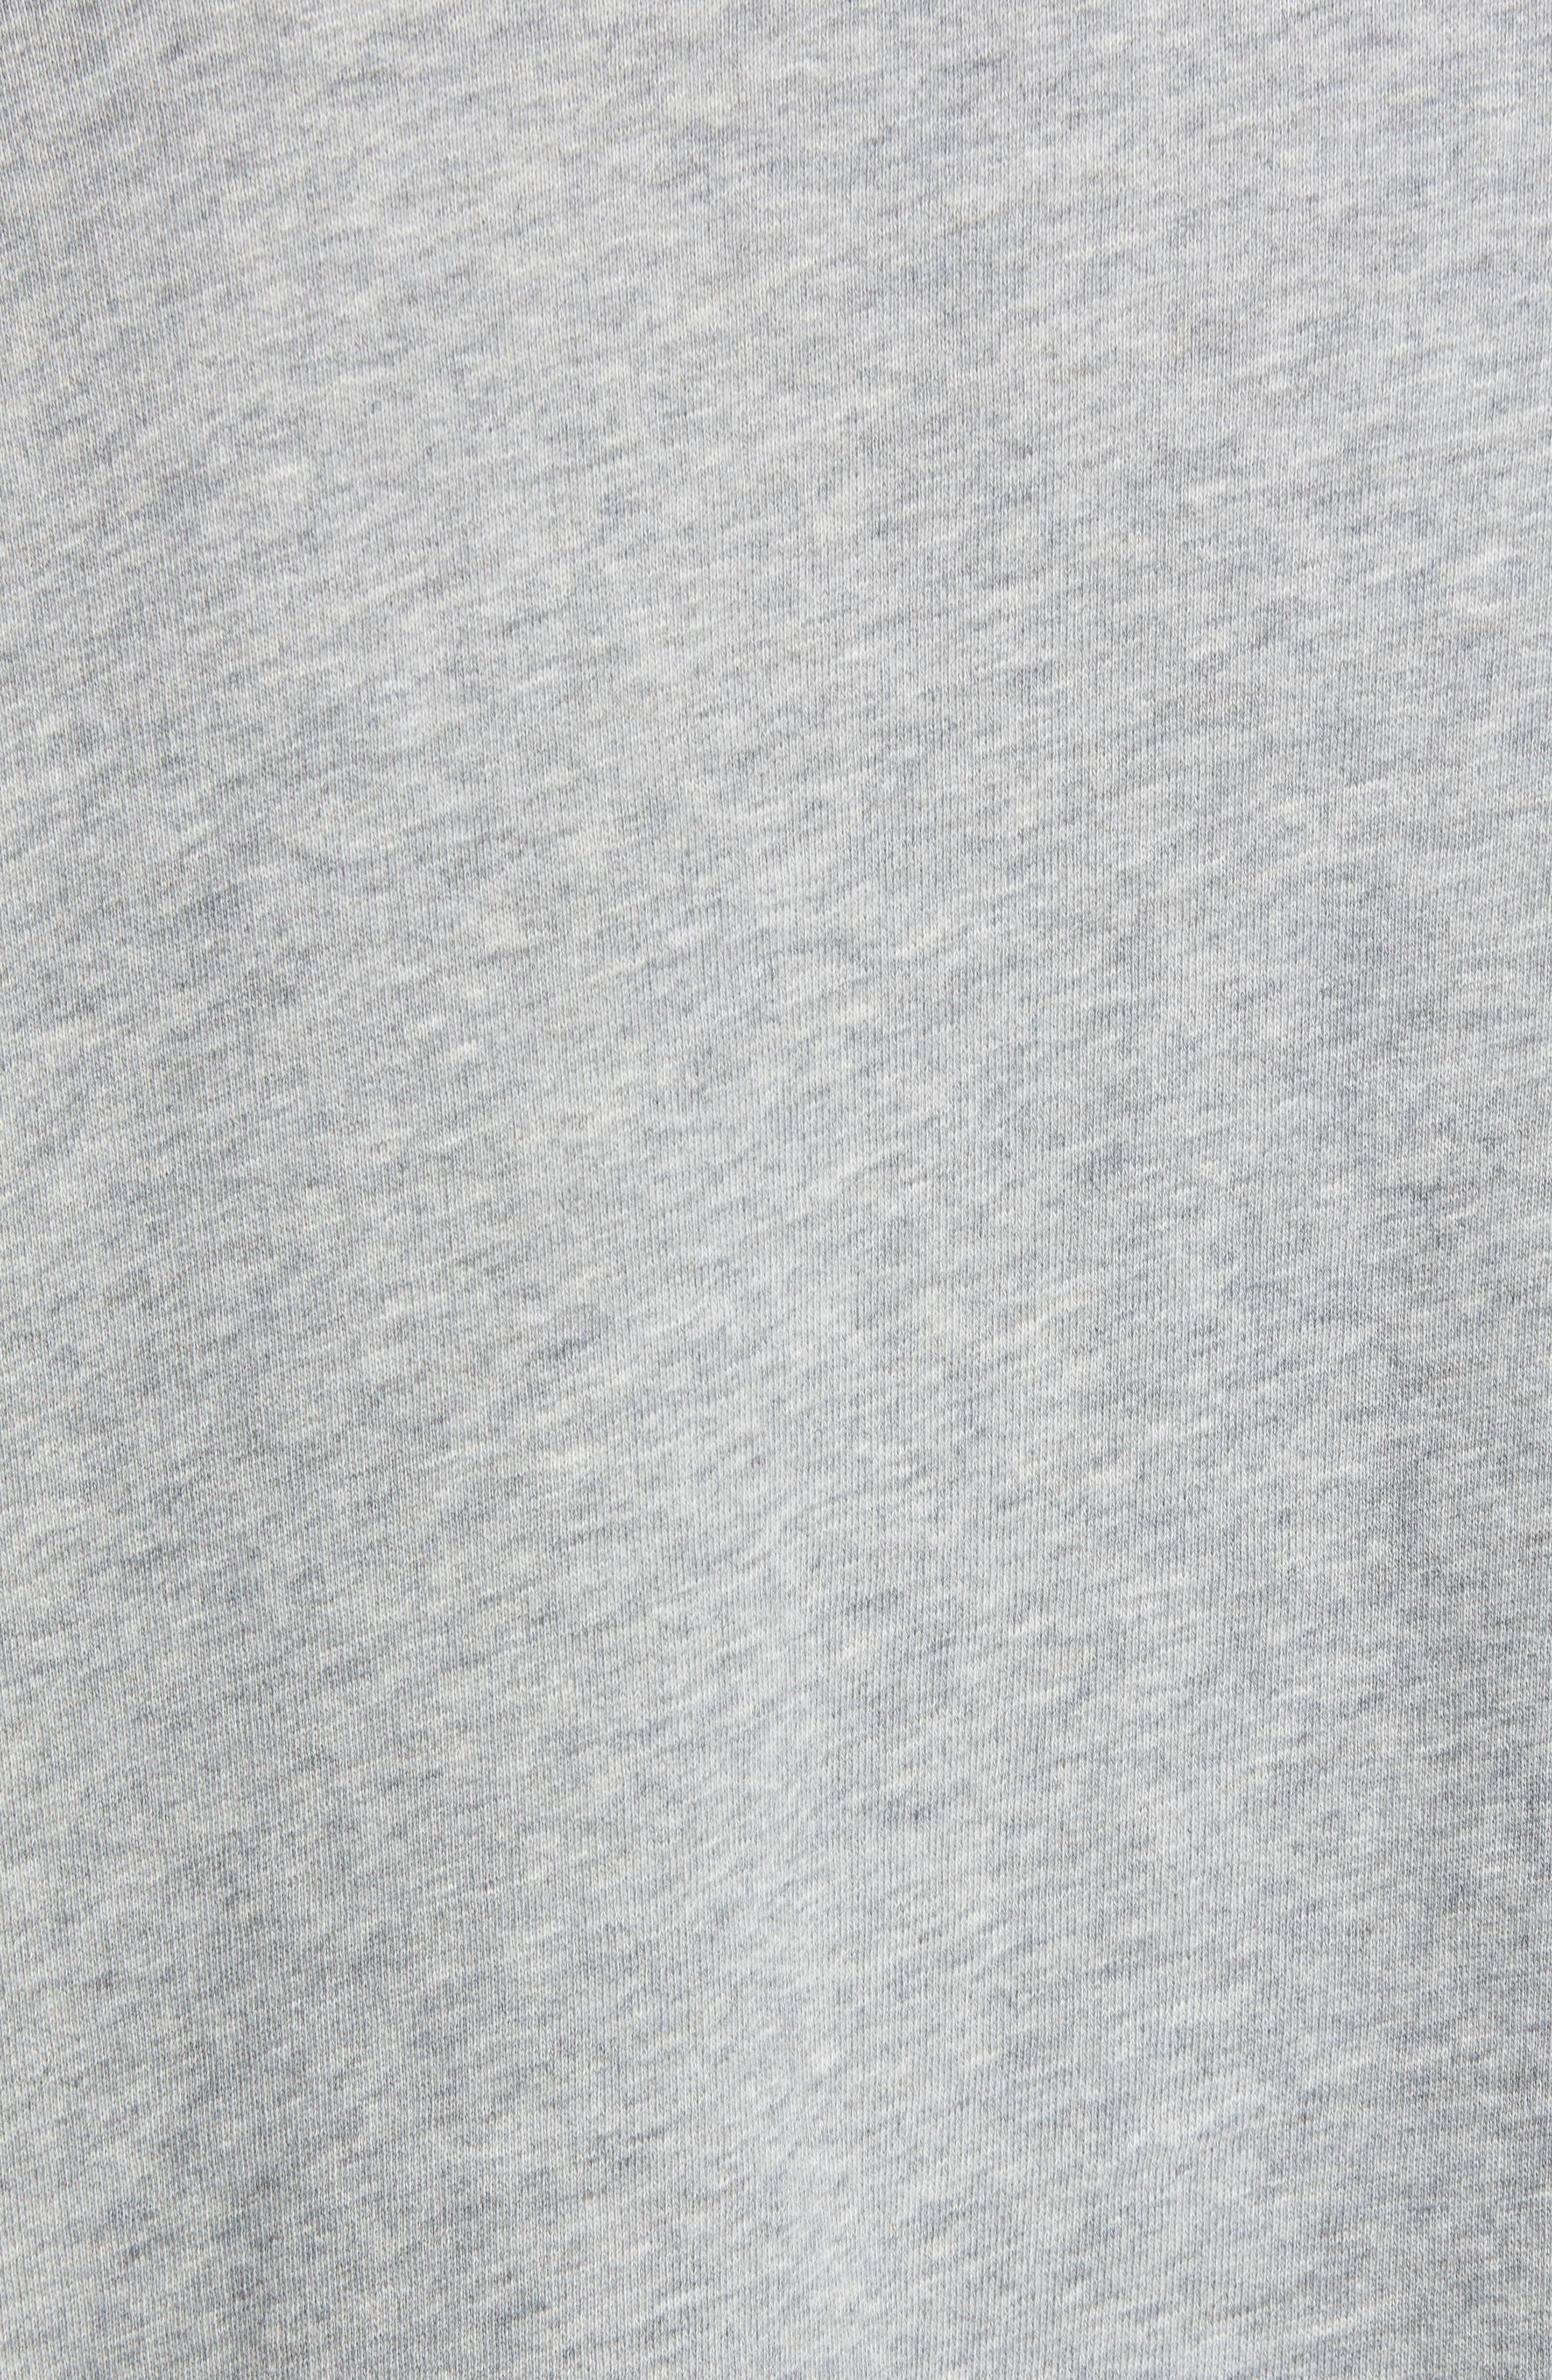 Alexa Stars Sweatshirt,                             Alternate thumbnail 5, color,                             GREY